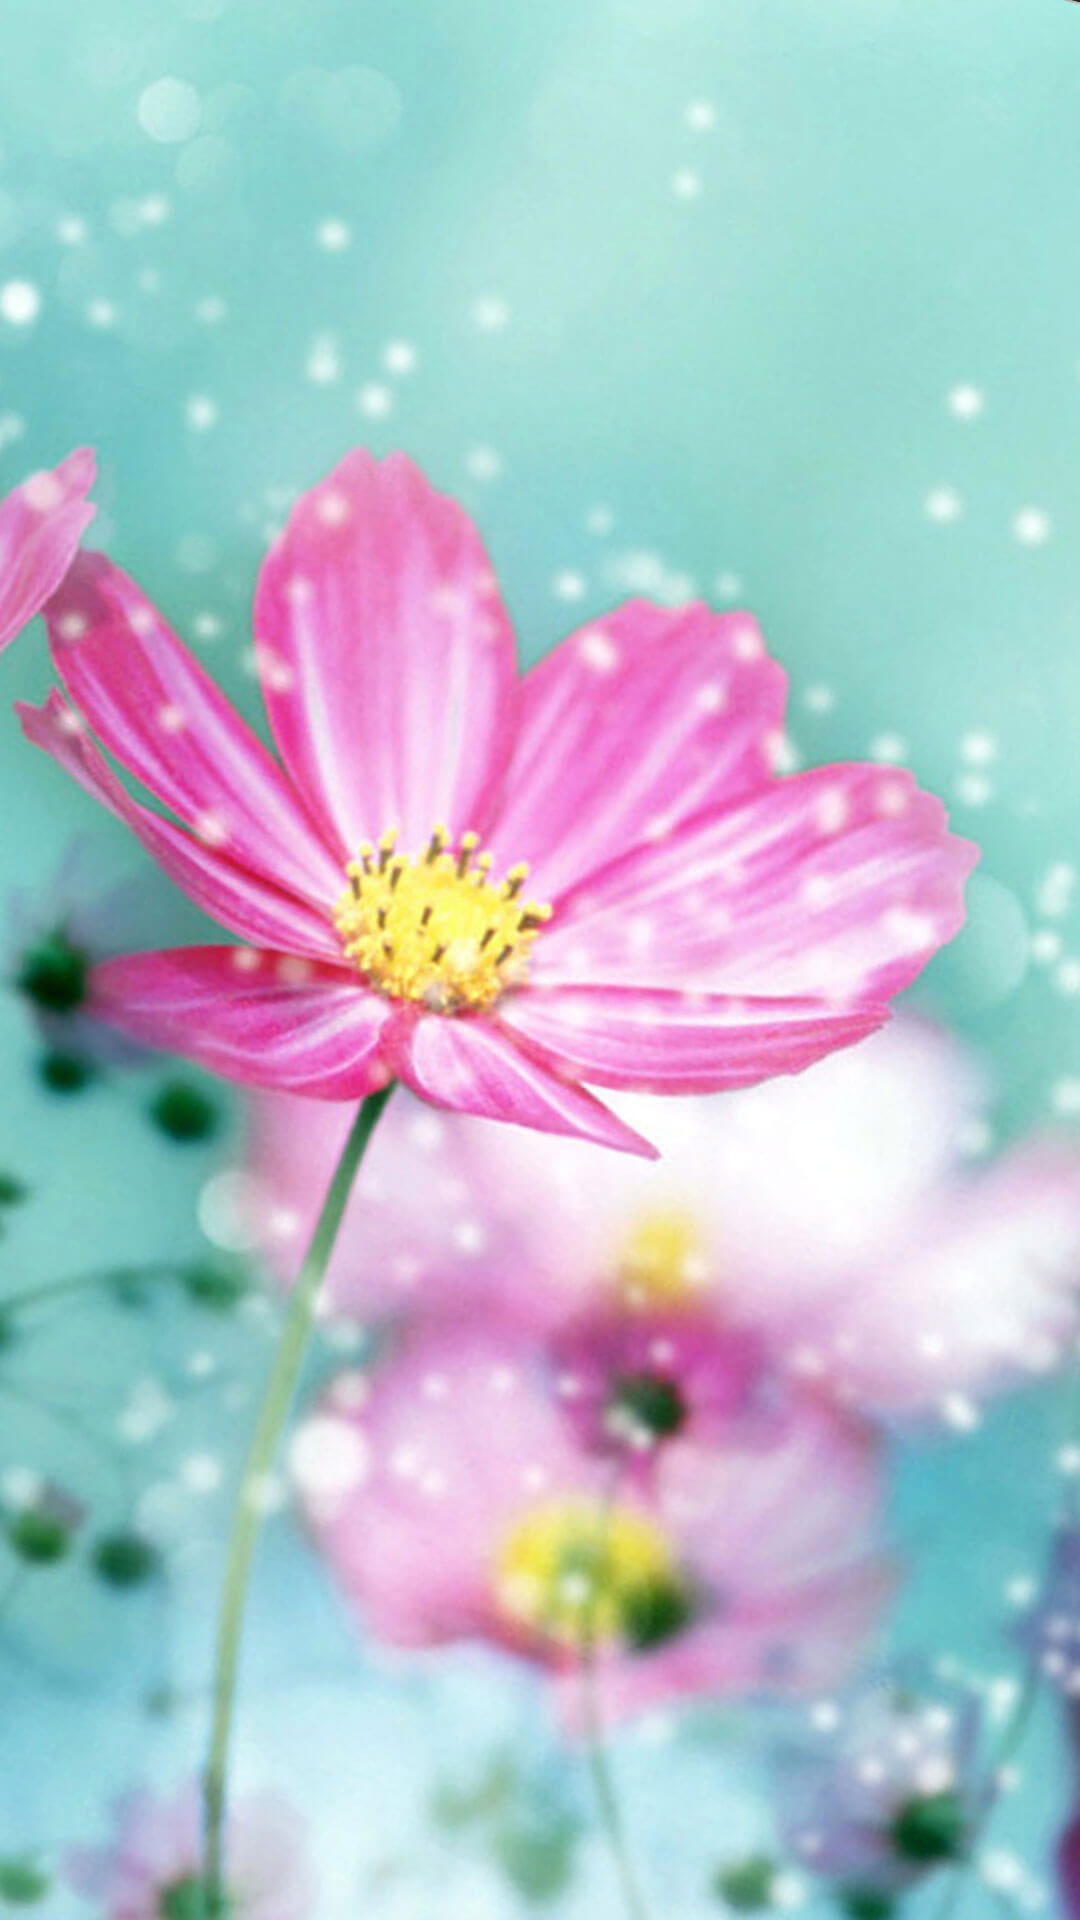 Spring Flower Wallpaper Backgrounds ·① WallpaperTag